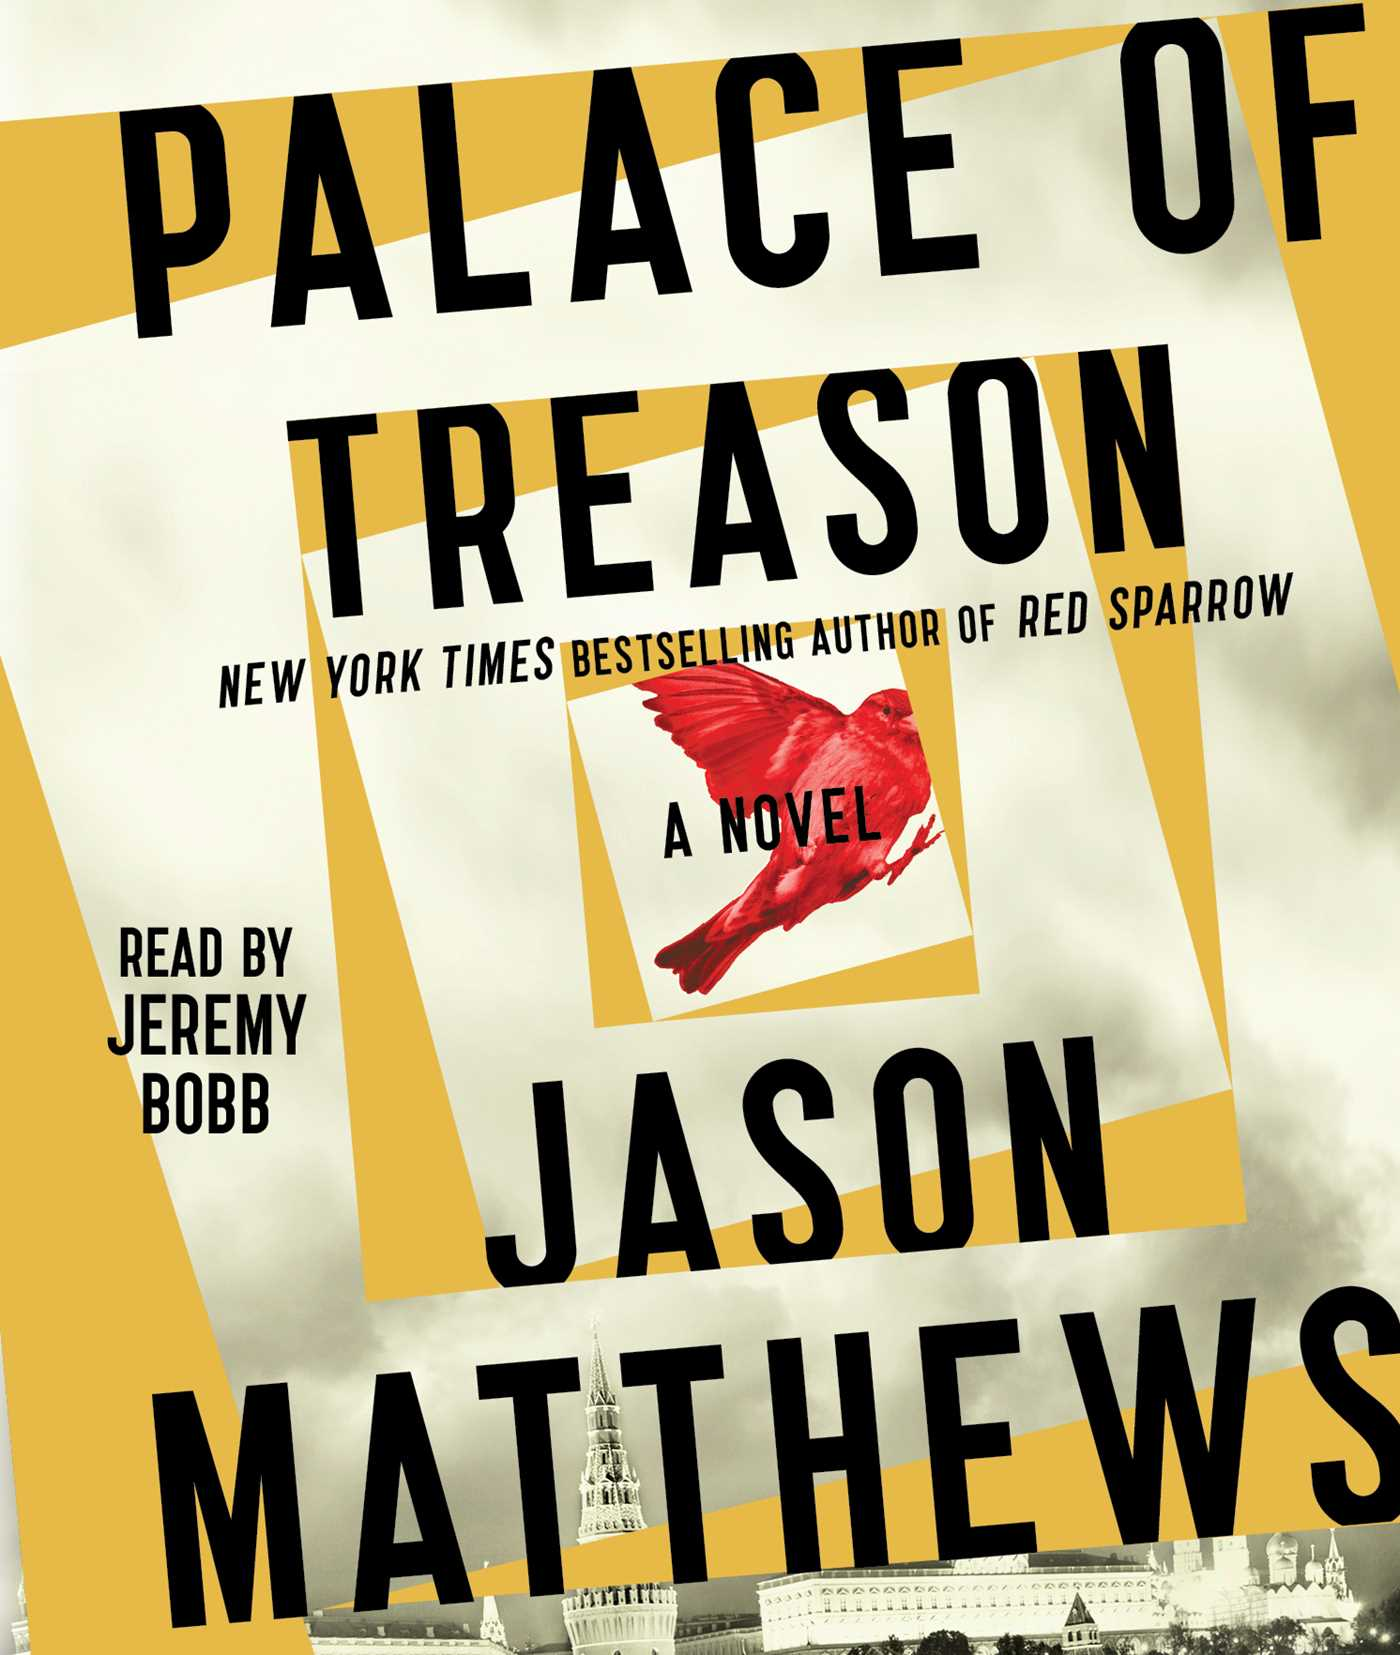 Palace of treason 9781442380882 hr